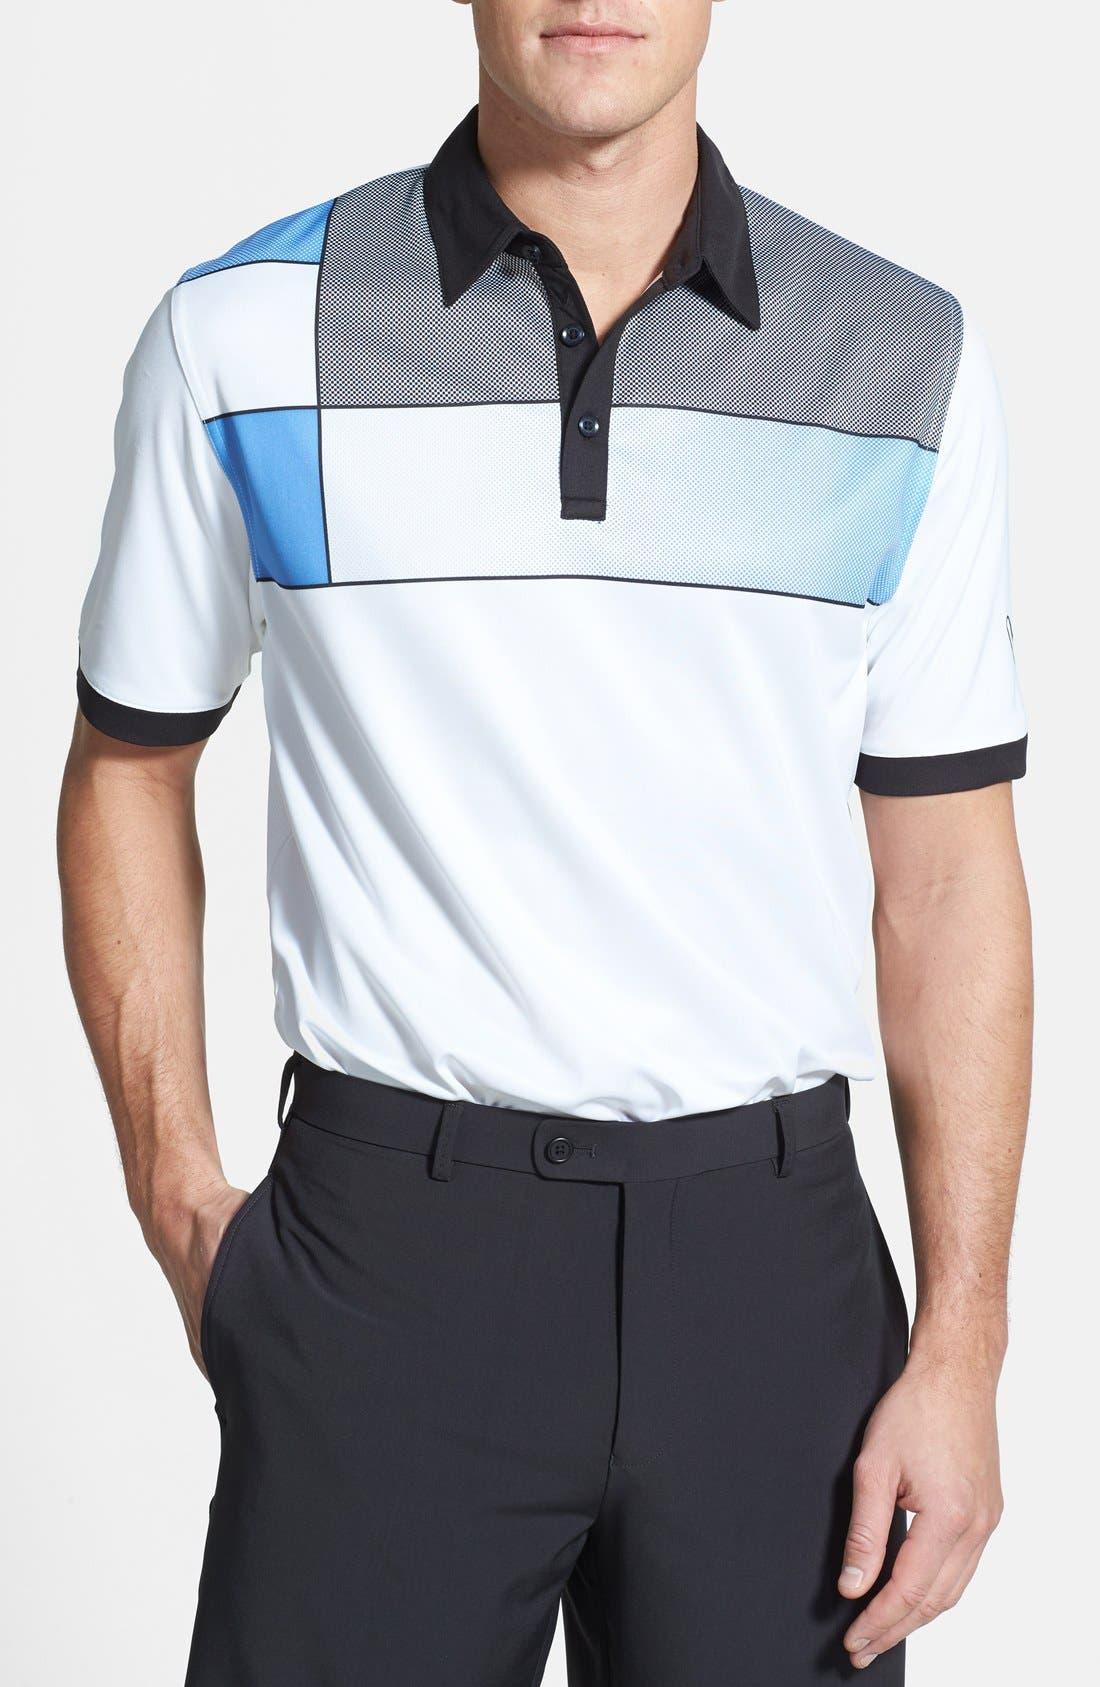 Main Image - Callaway Golf® 'Vibe' Opti-Dri Moisture Wicking Polo